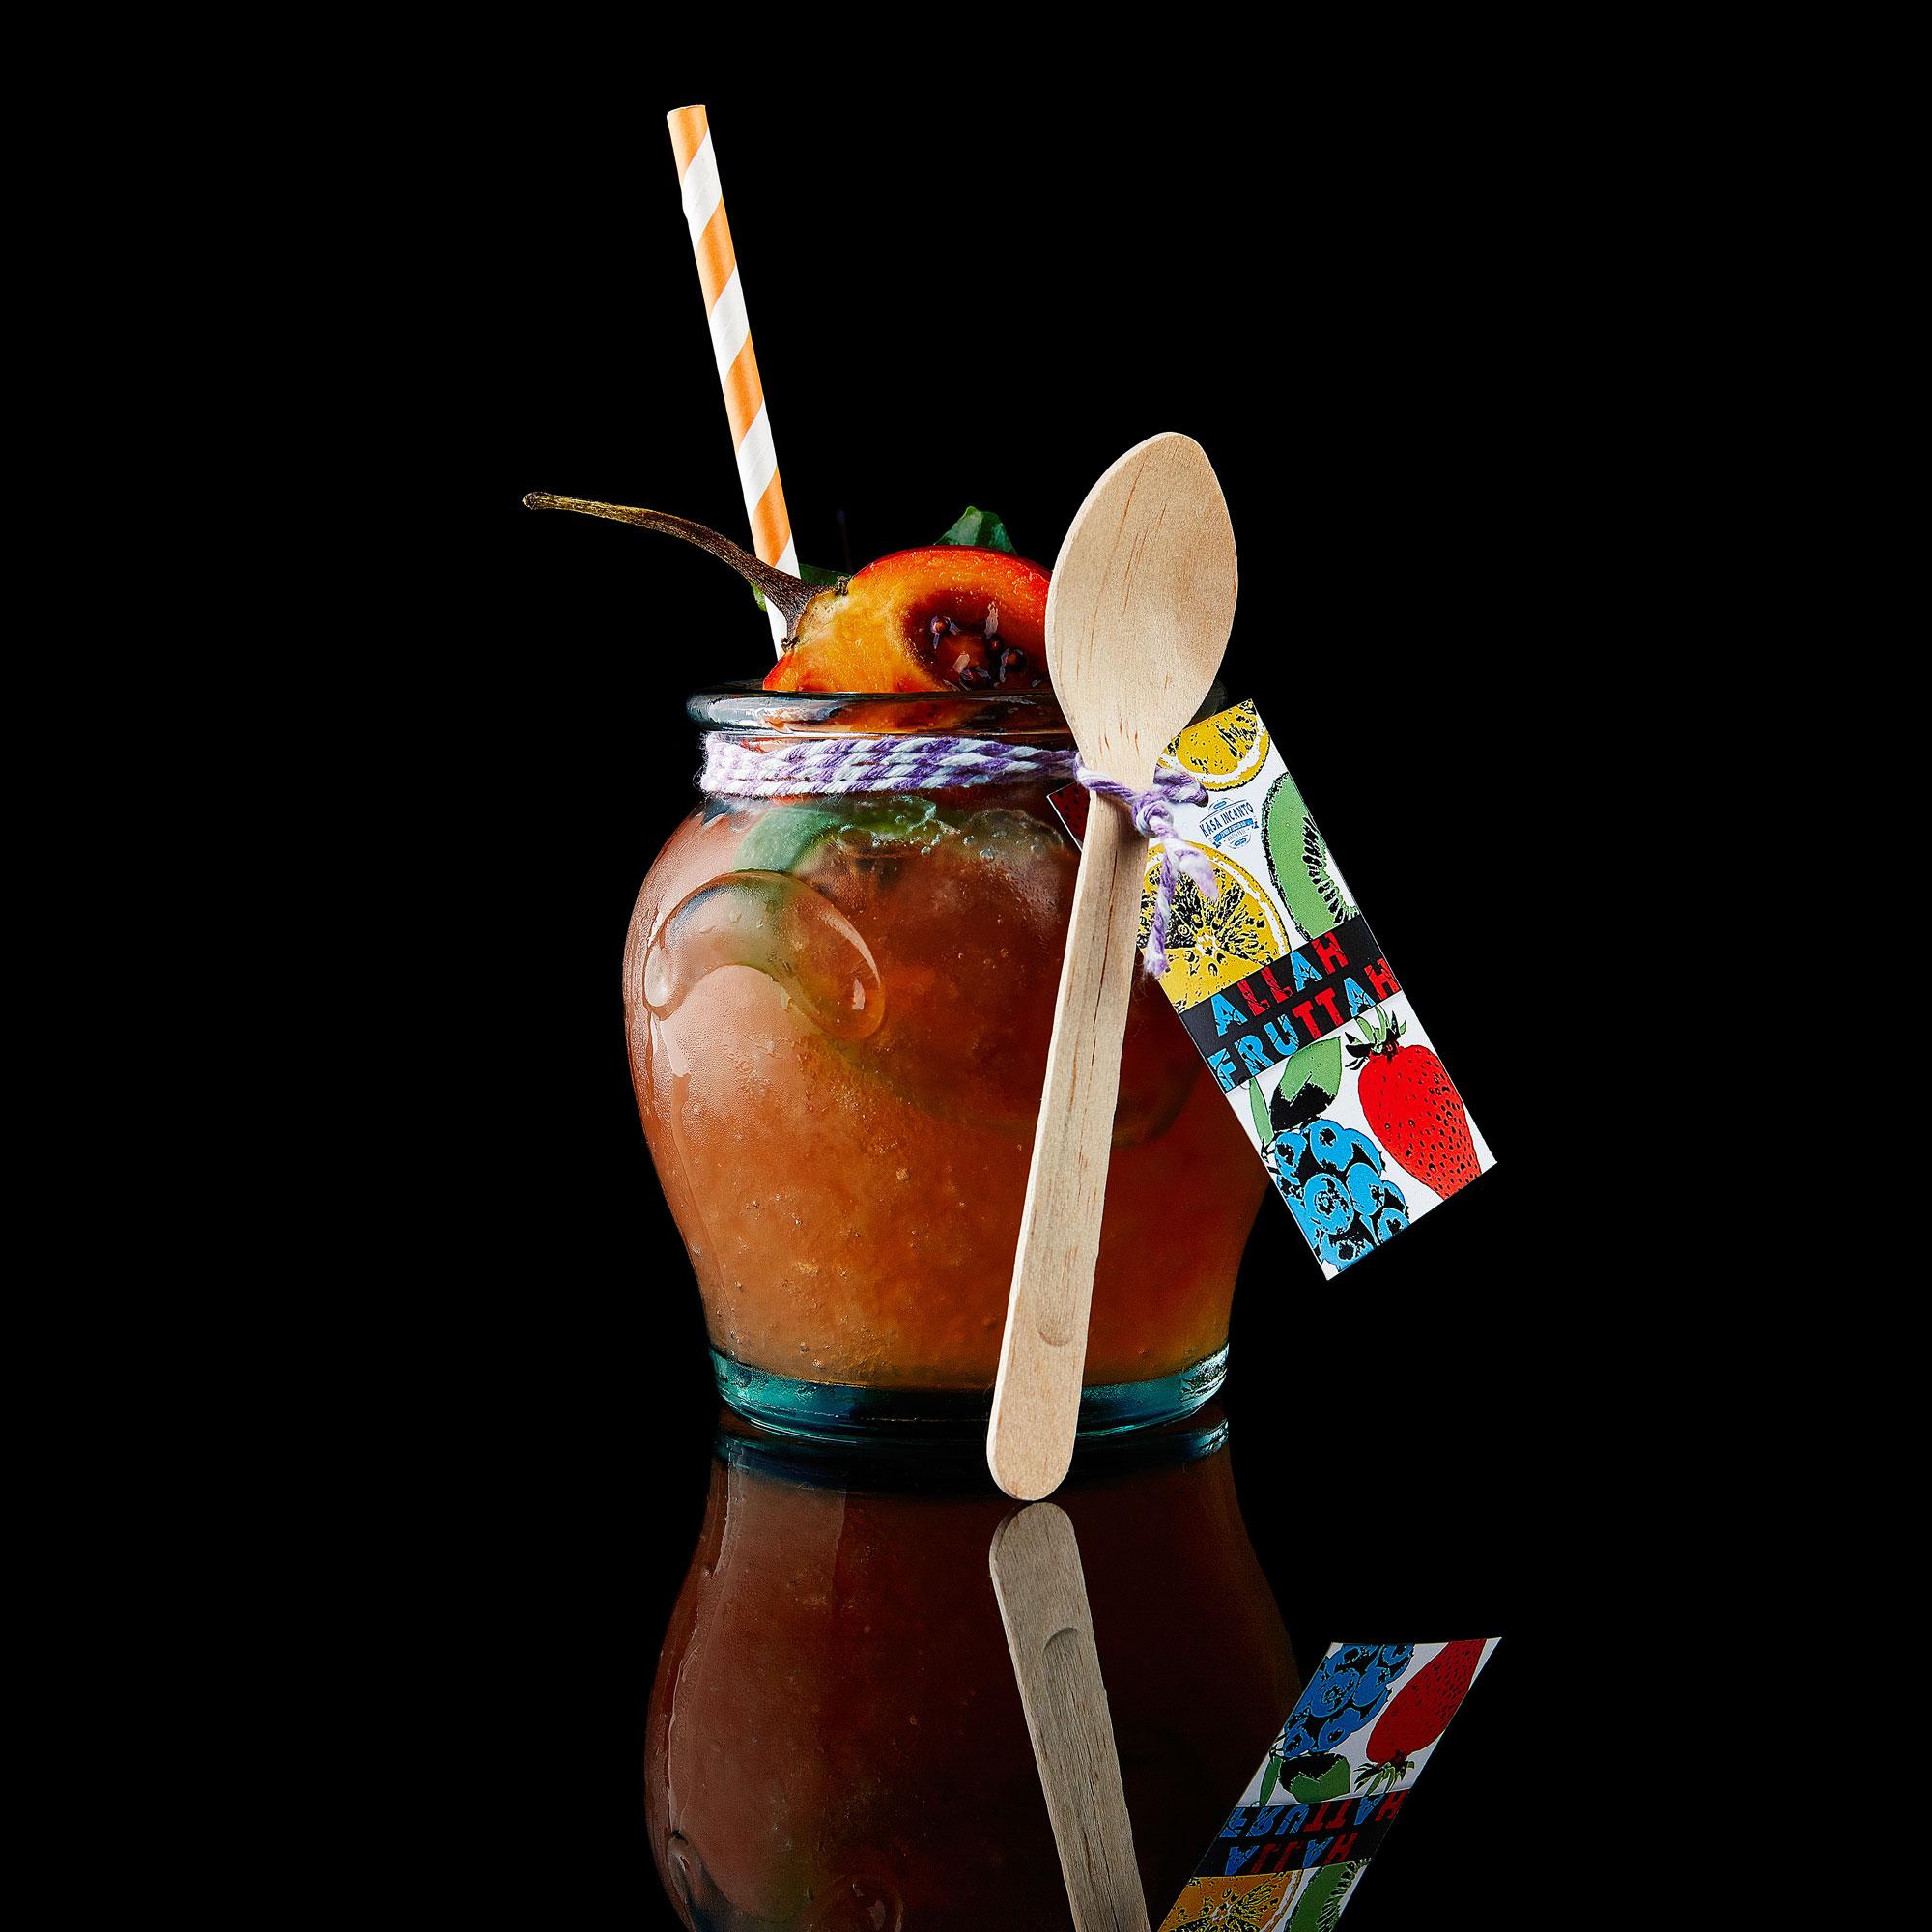 Allah_Fruttah_cocktail_Fabio_Camboni_bartender (1)